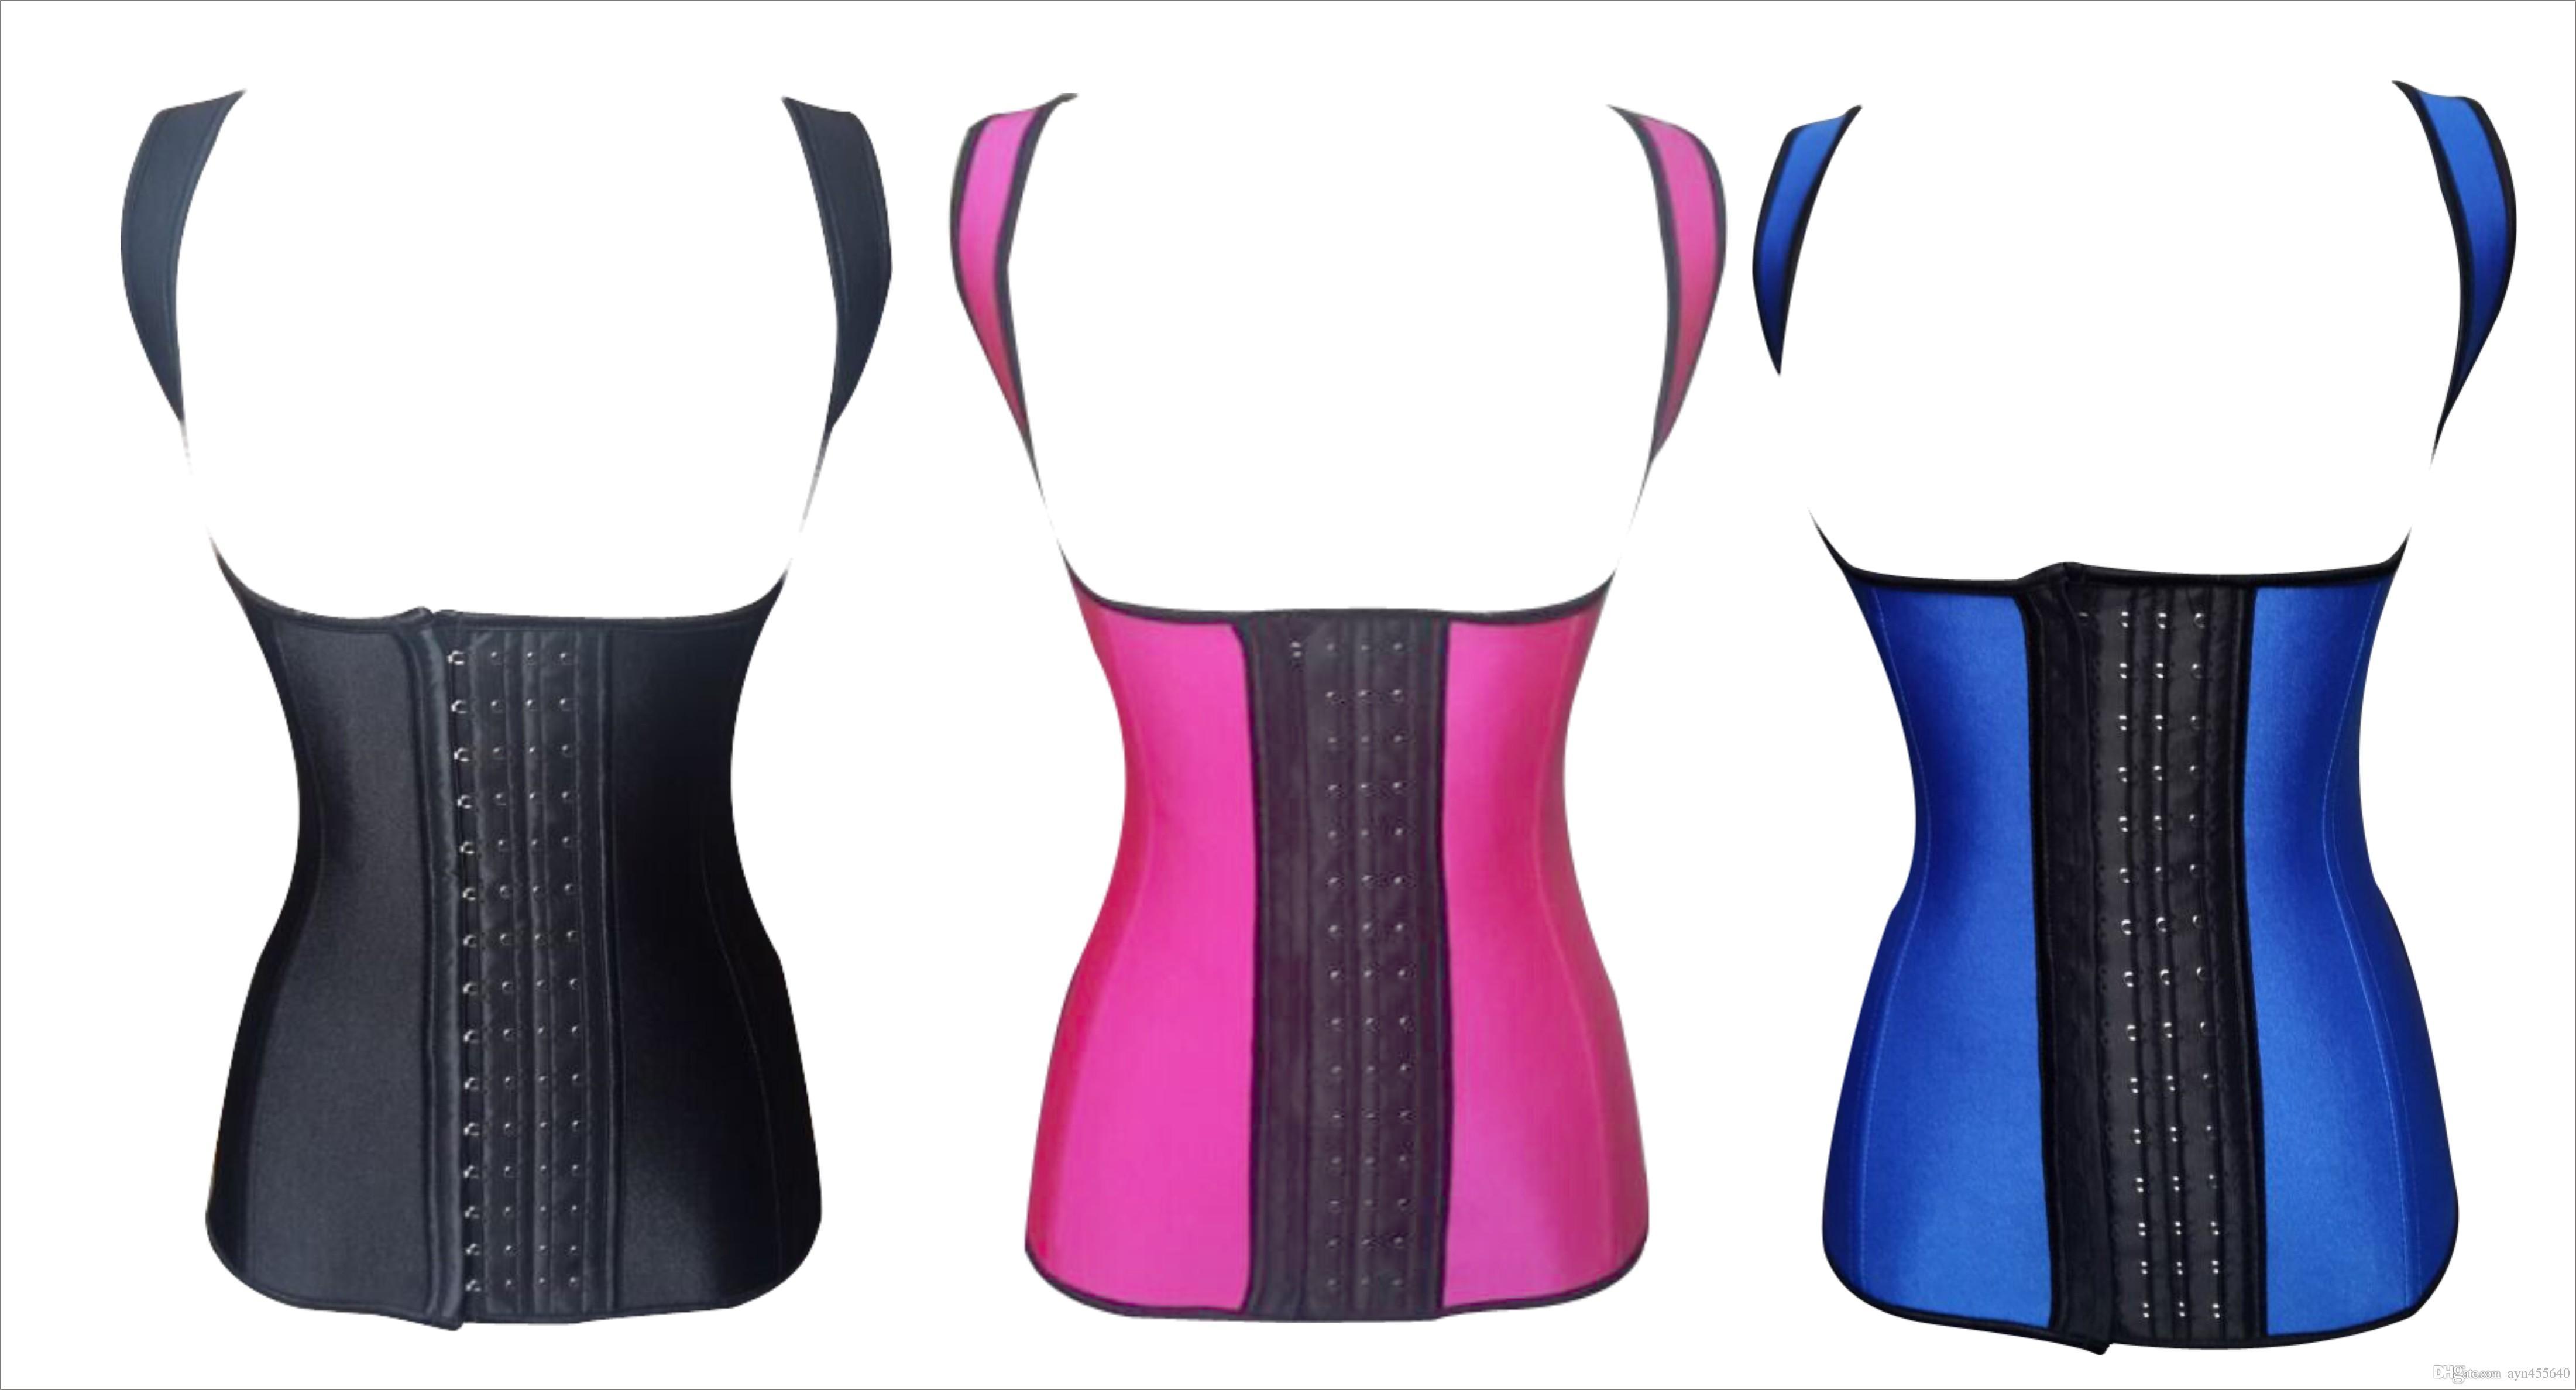 74c7ef9ed36 2019 2015 Sexy Latex Body Shaper Steel Boned Waist Waist Training Corset  Vest Latex Waist Trainer Cincher Corset Postpartum Slimming Shapewear From  ...